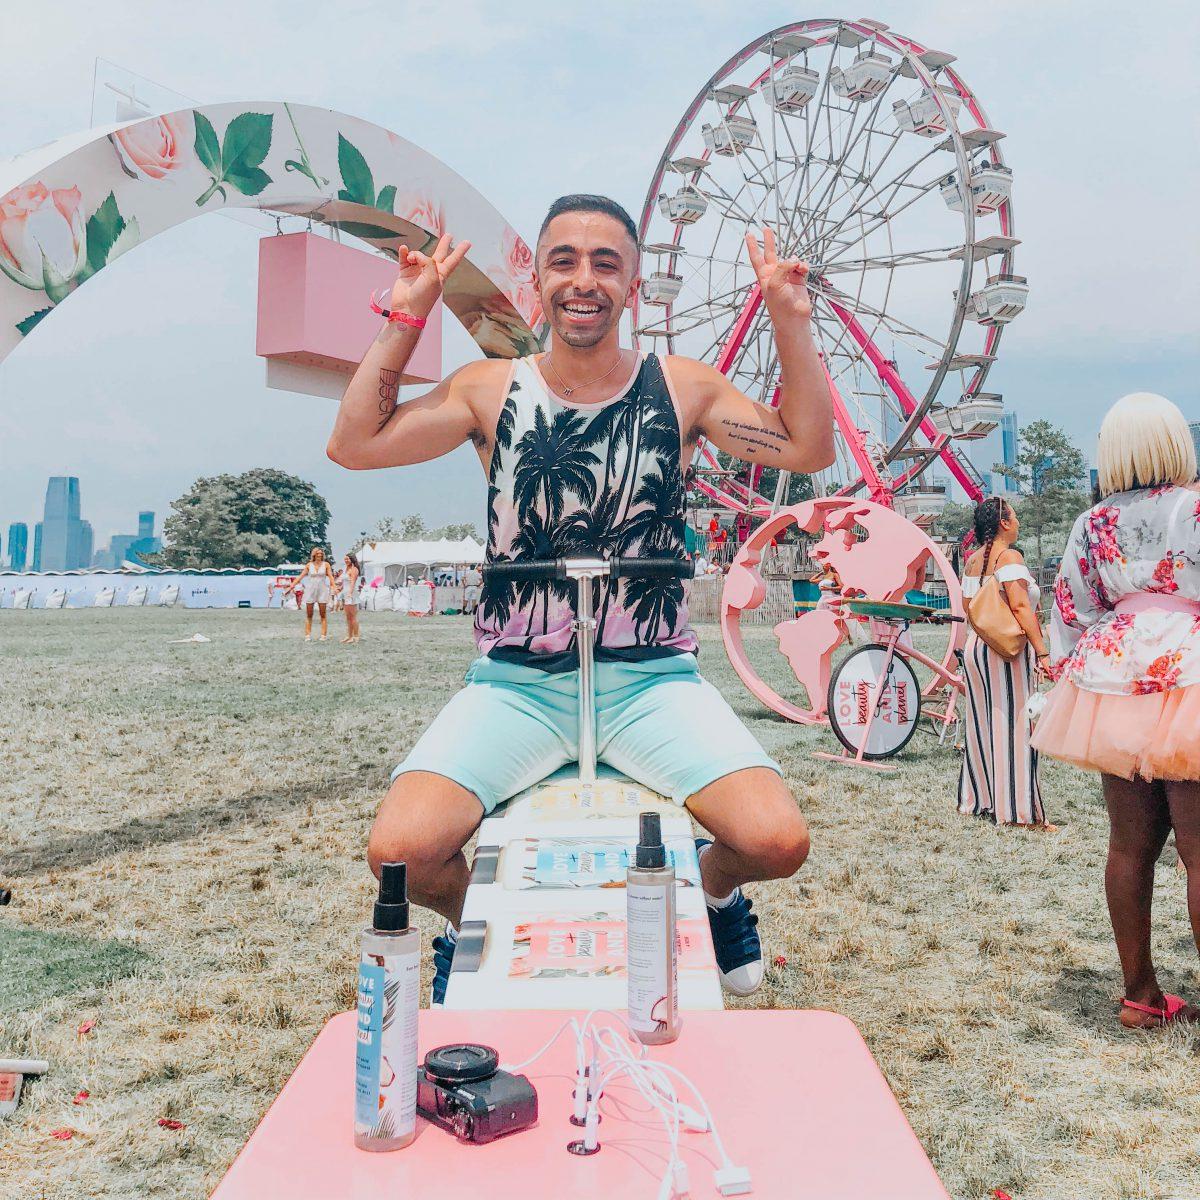 pinknic festival